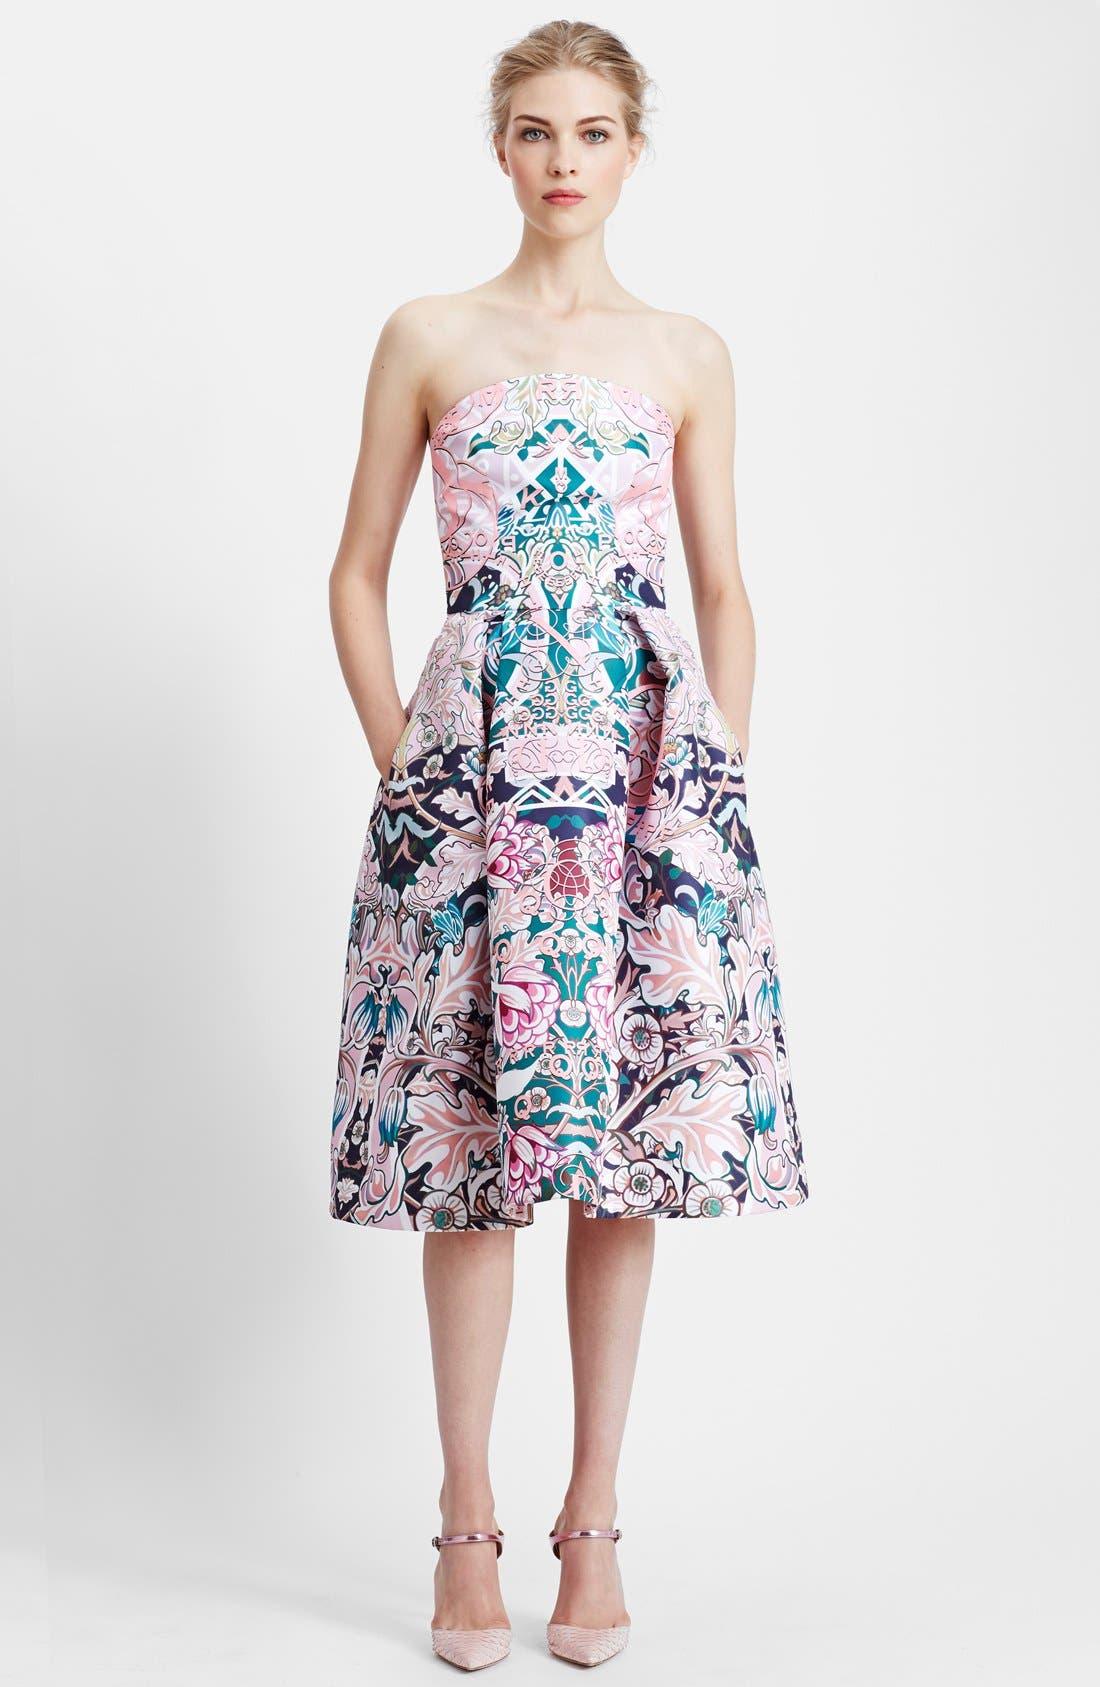 Alternate Image 1 Selected - Mary Katrantzou Print Strapless Fit & Flare Dress